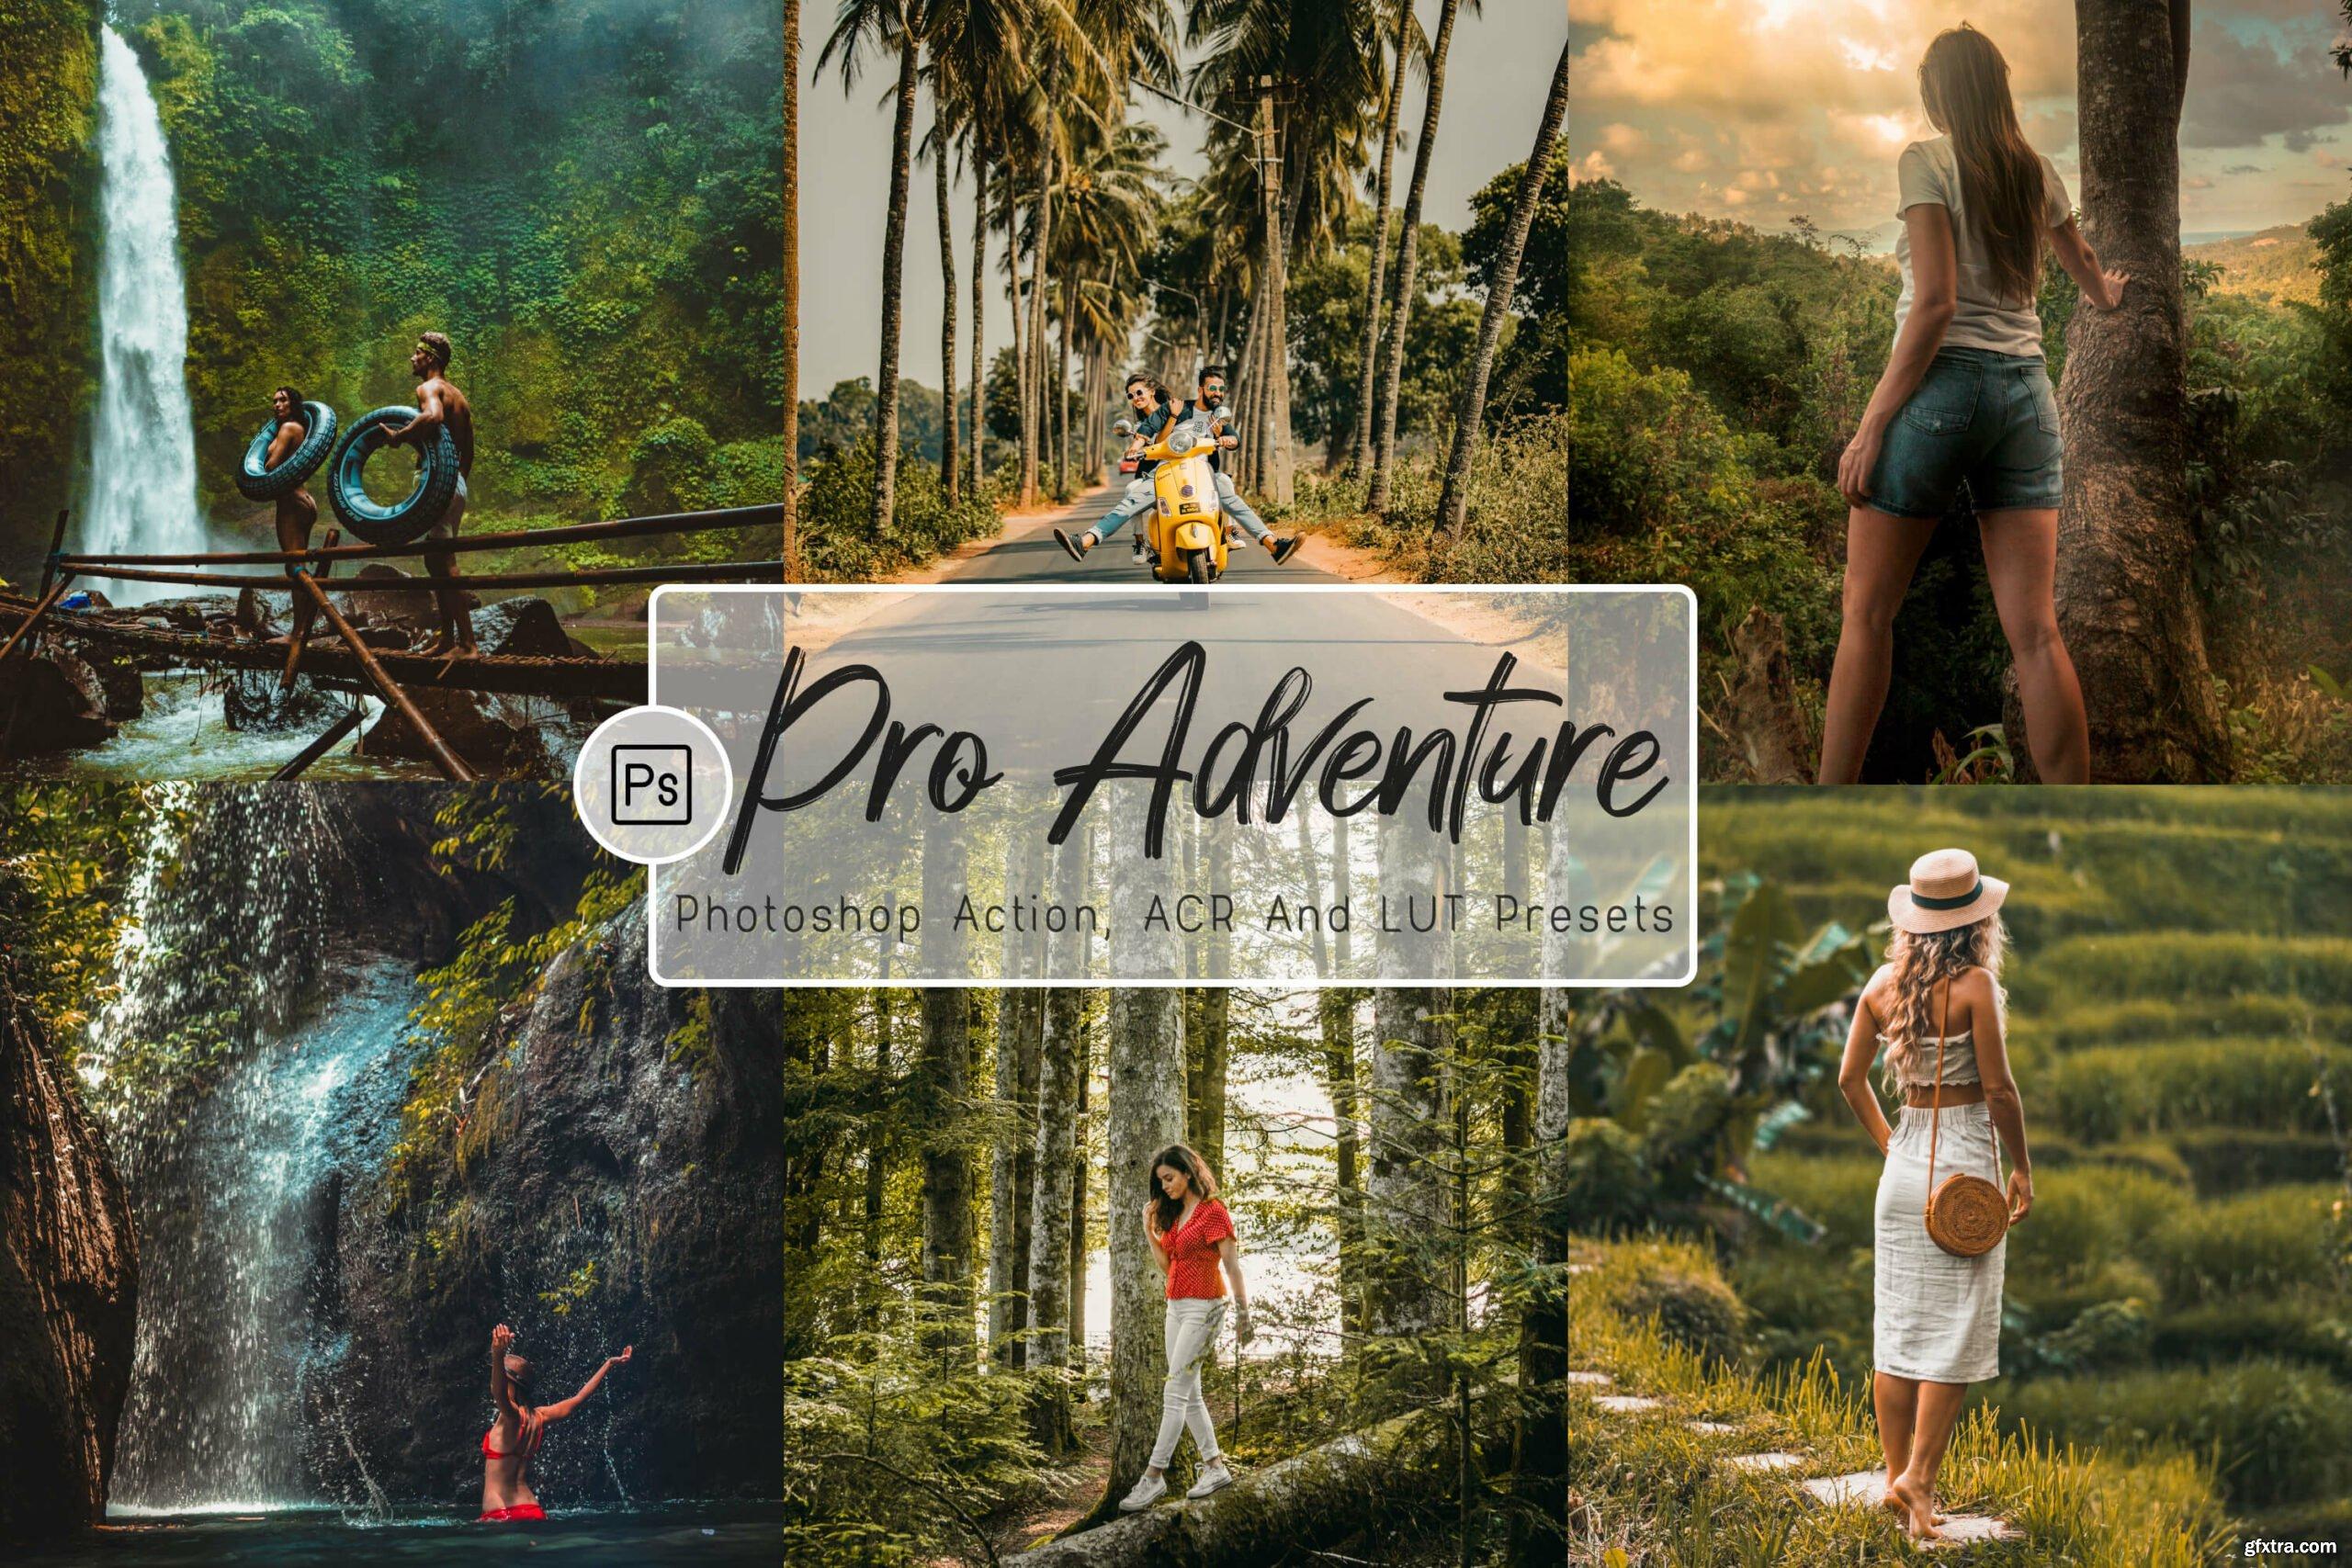 FreePSDvn - Free Photoshop Actions, Lightroom Presets, PSD